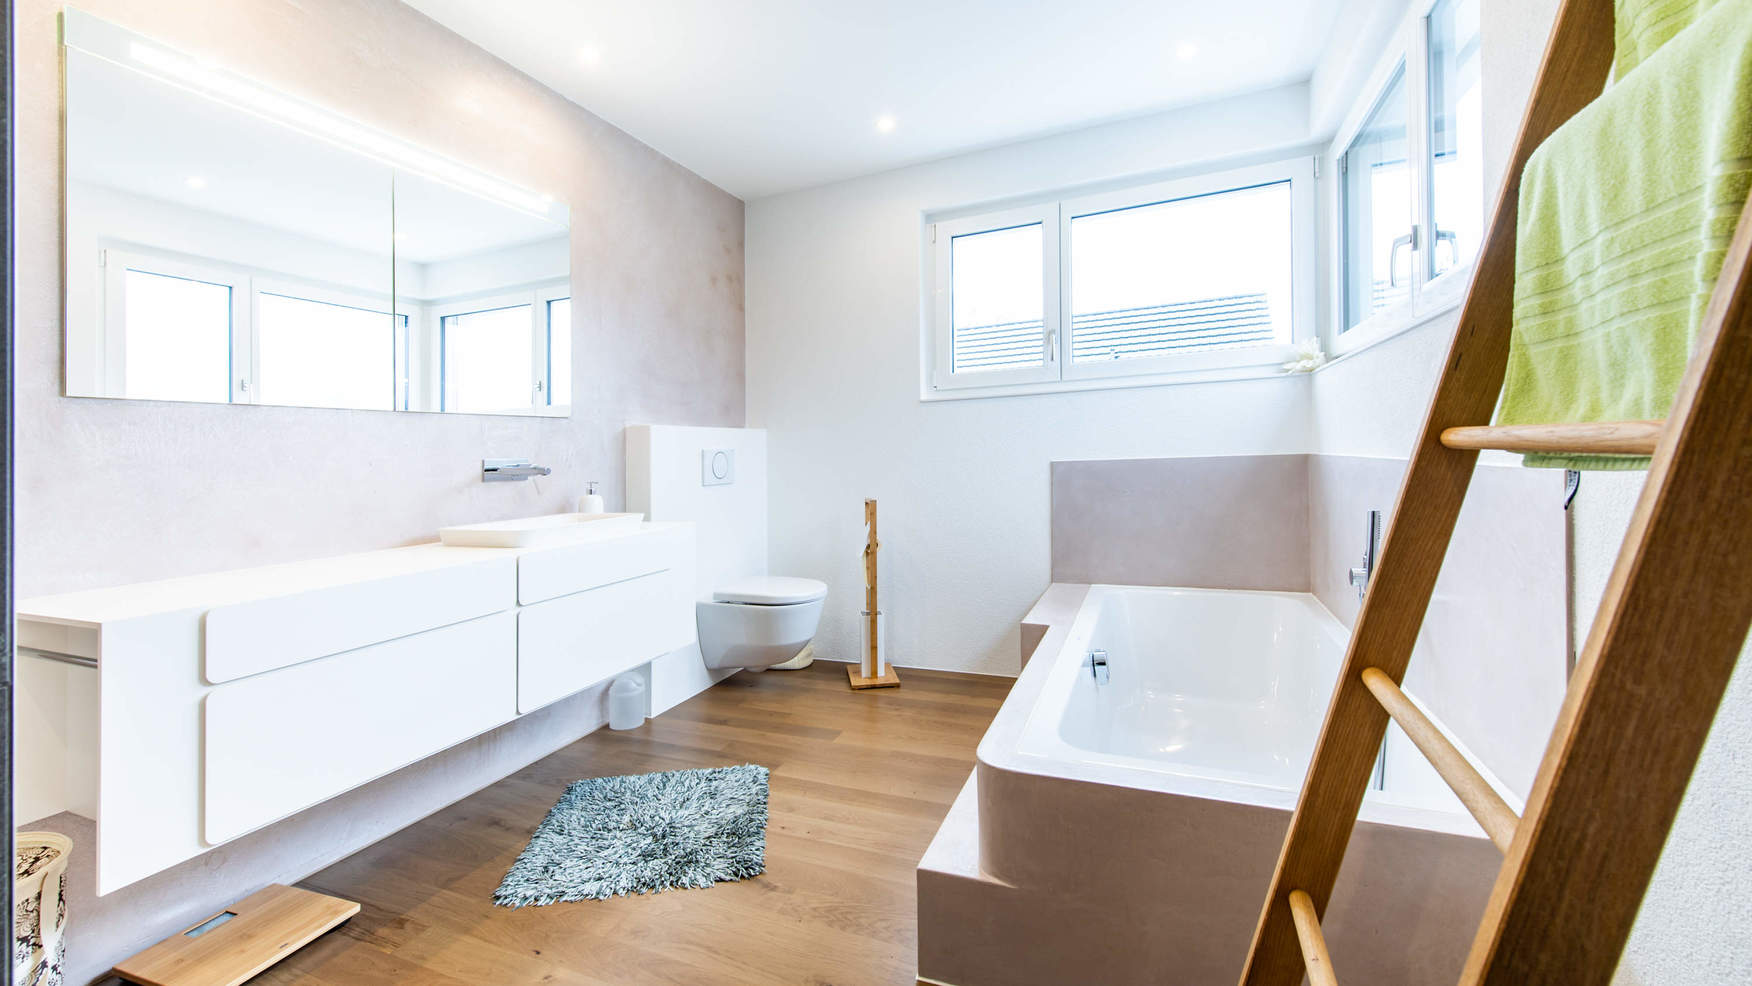 Umgebautes Badezimmer mit Beleuchtung